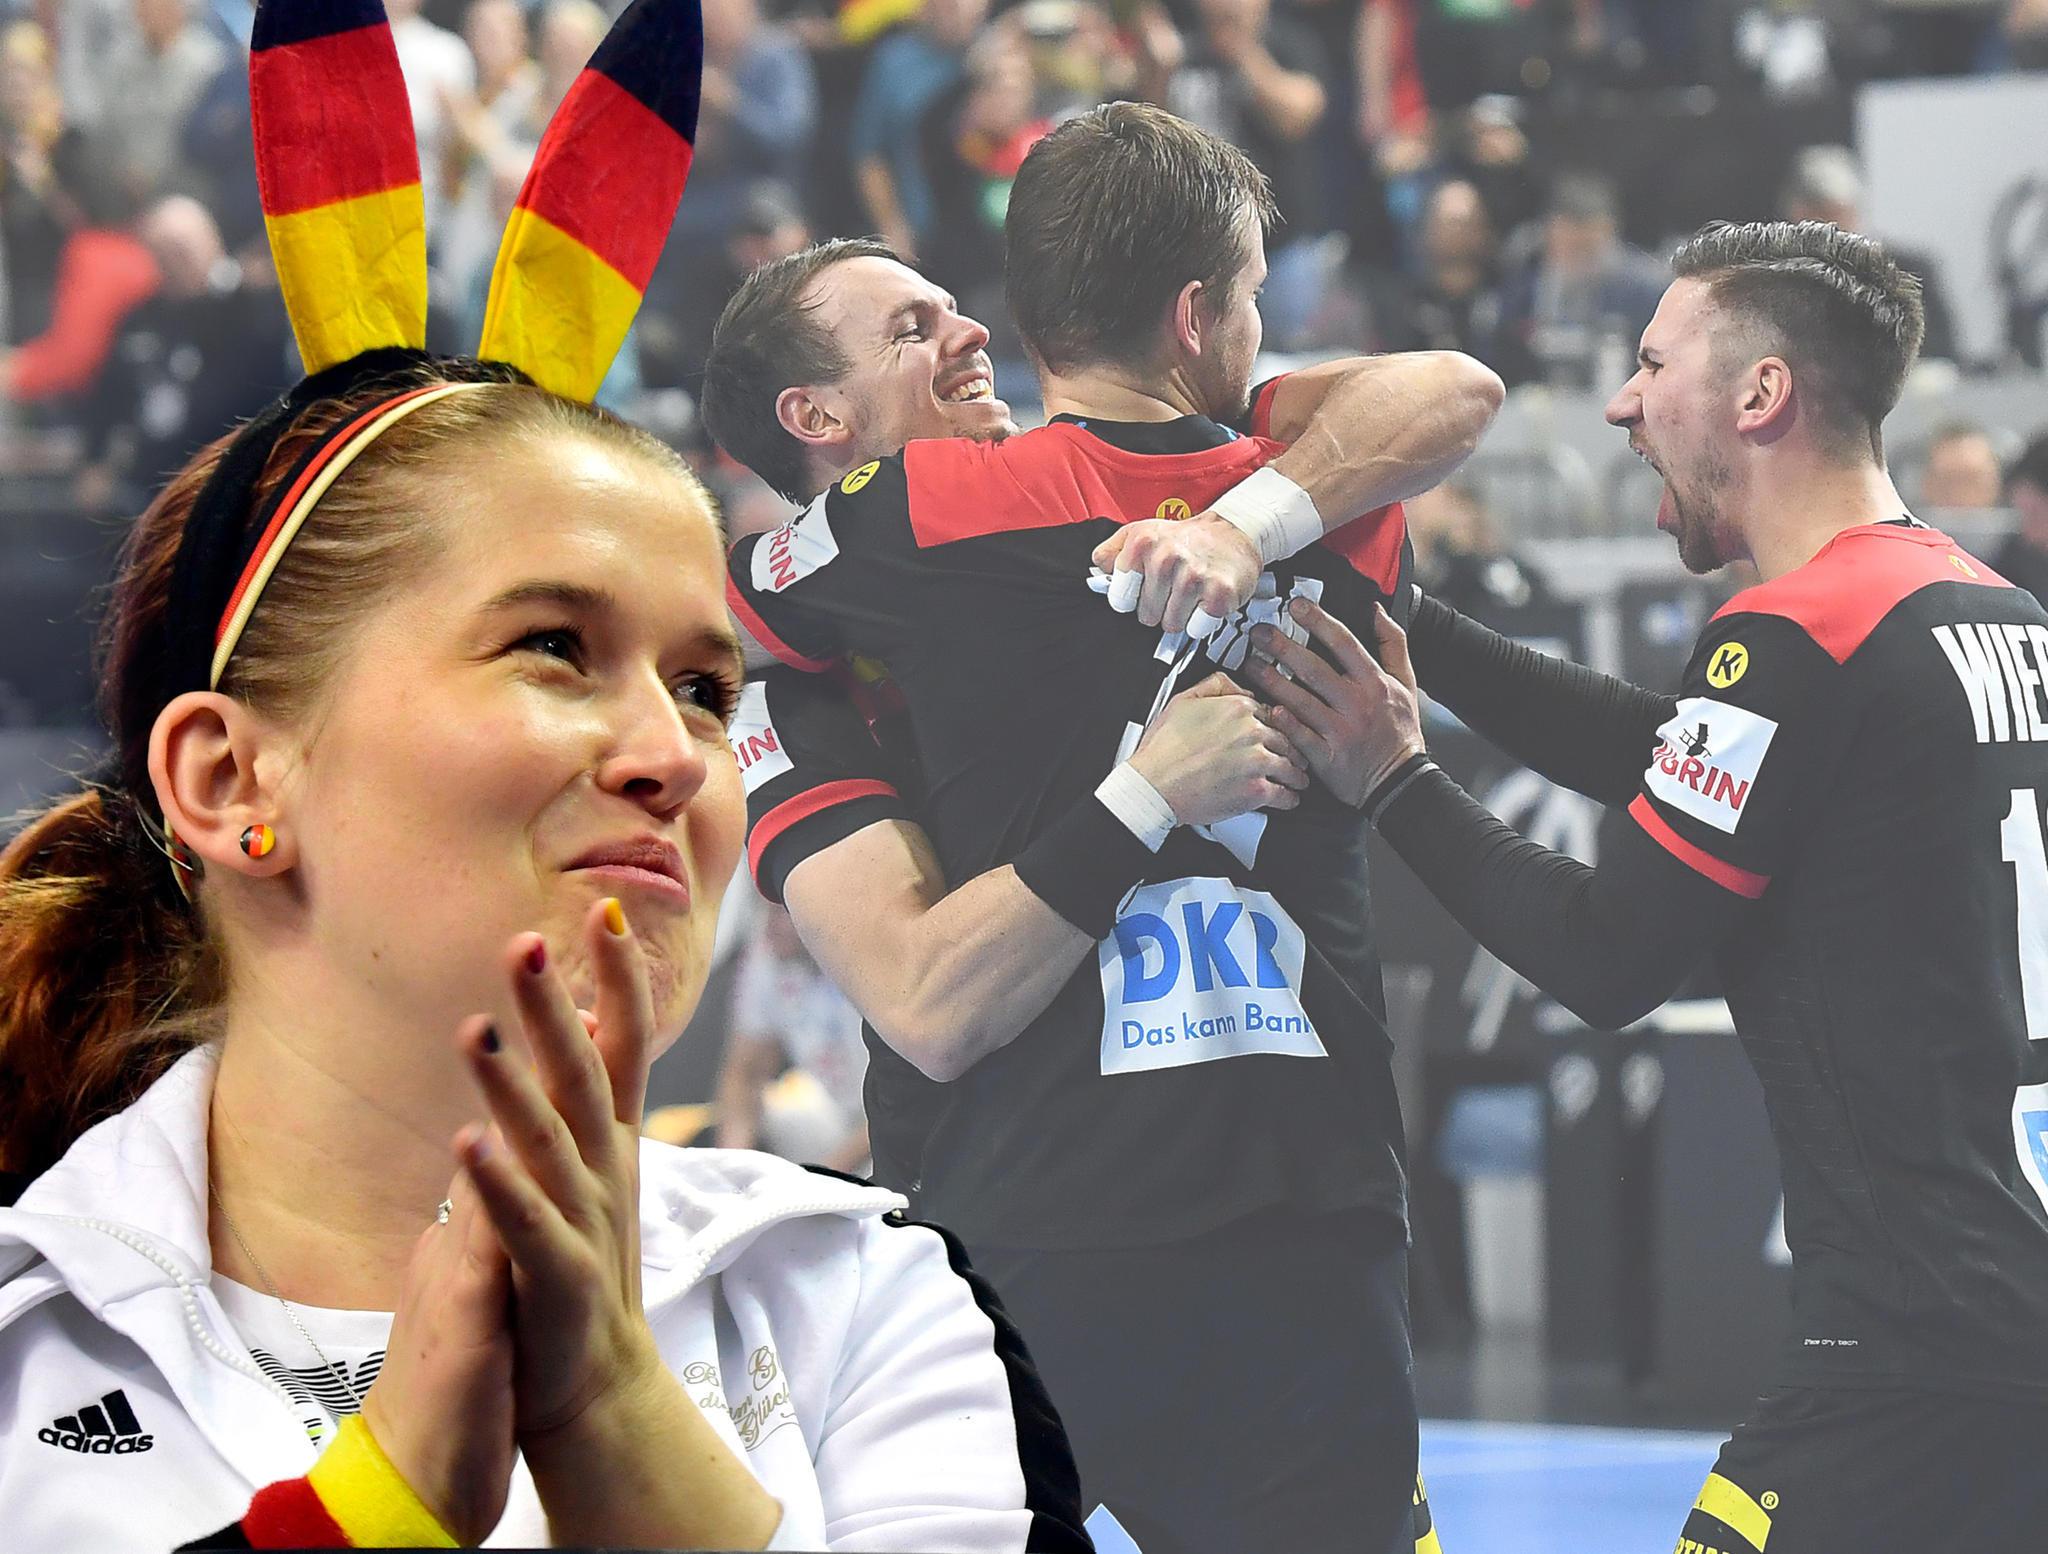 deutsche nationalmannschaft spieler em 2019